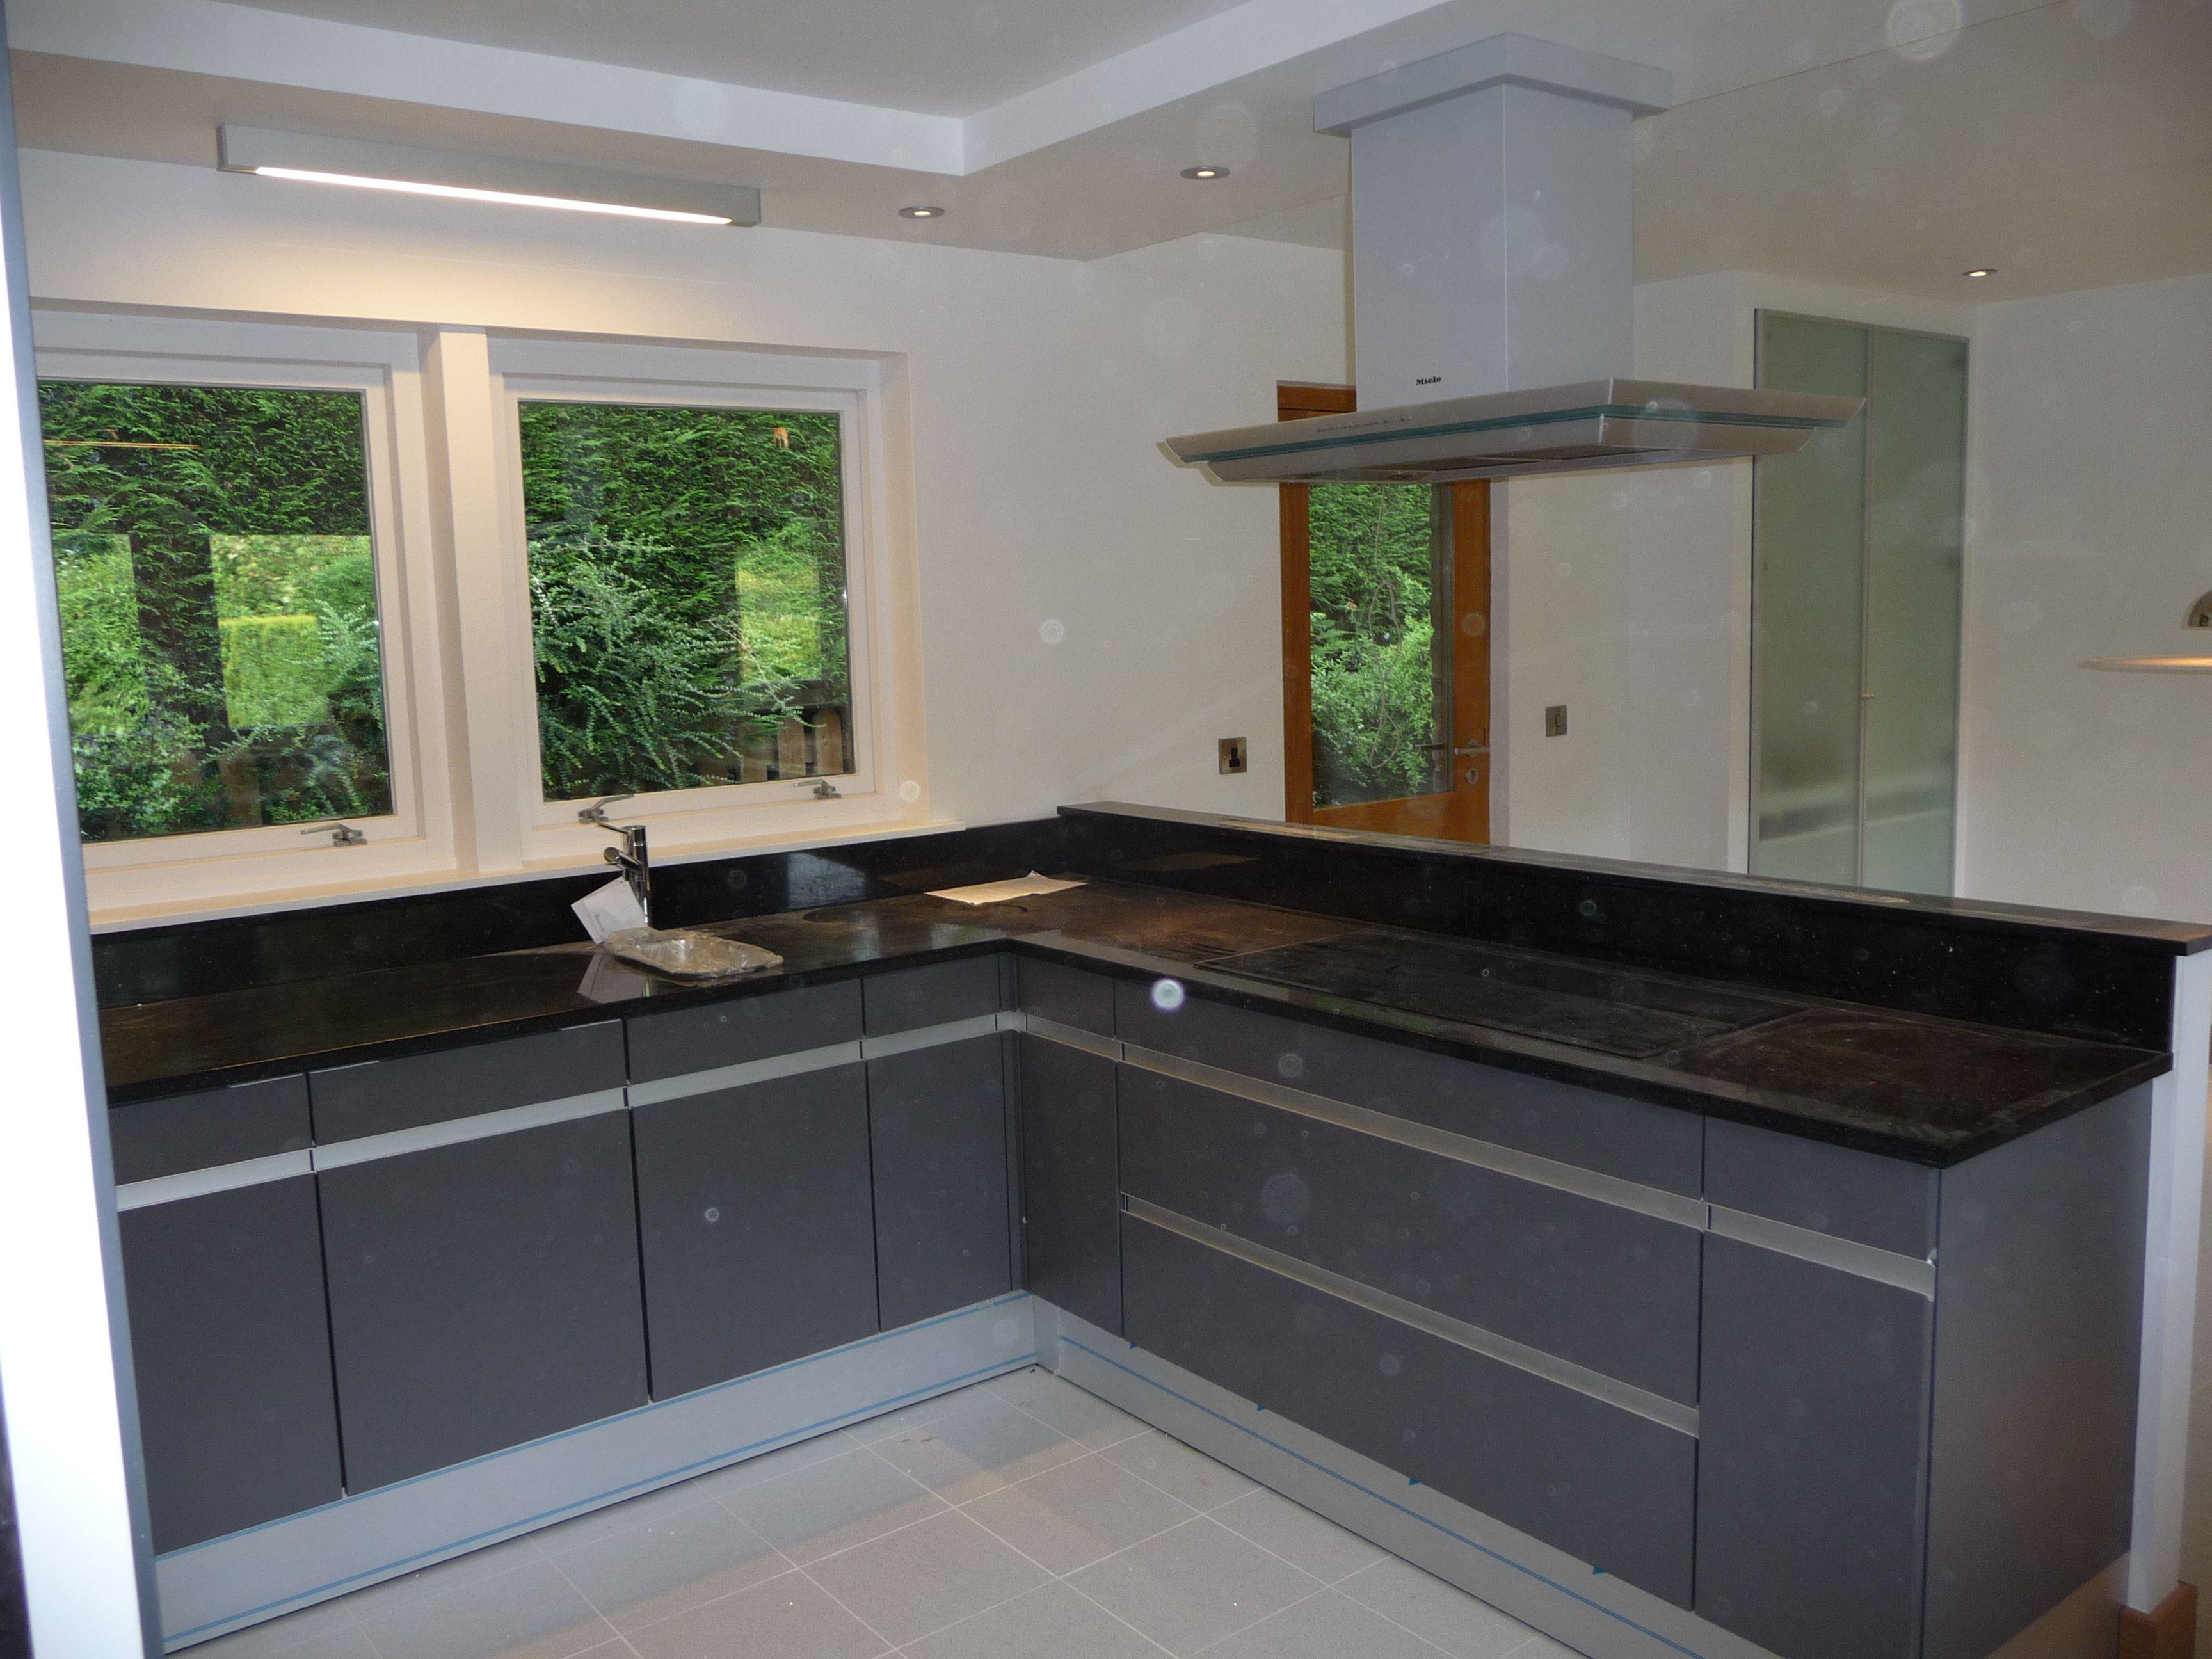 Bramhope, Leeds. Full house refurbishment by Derry